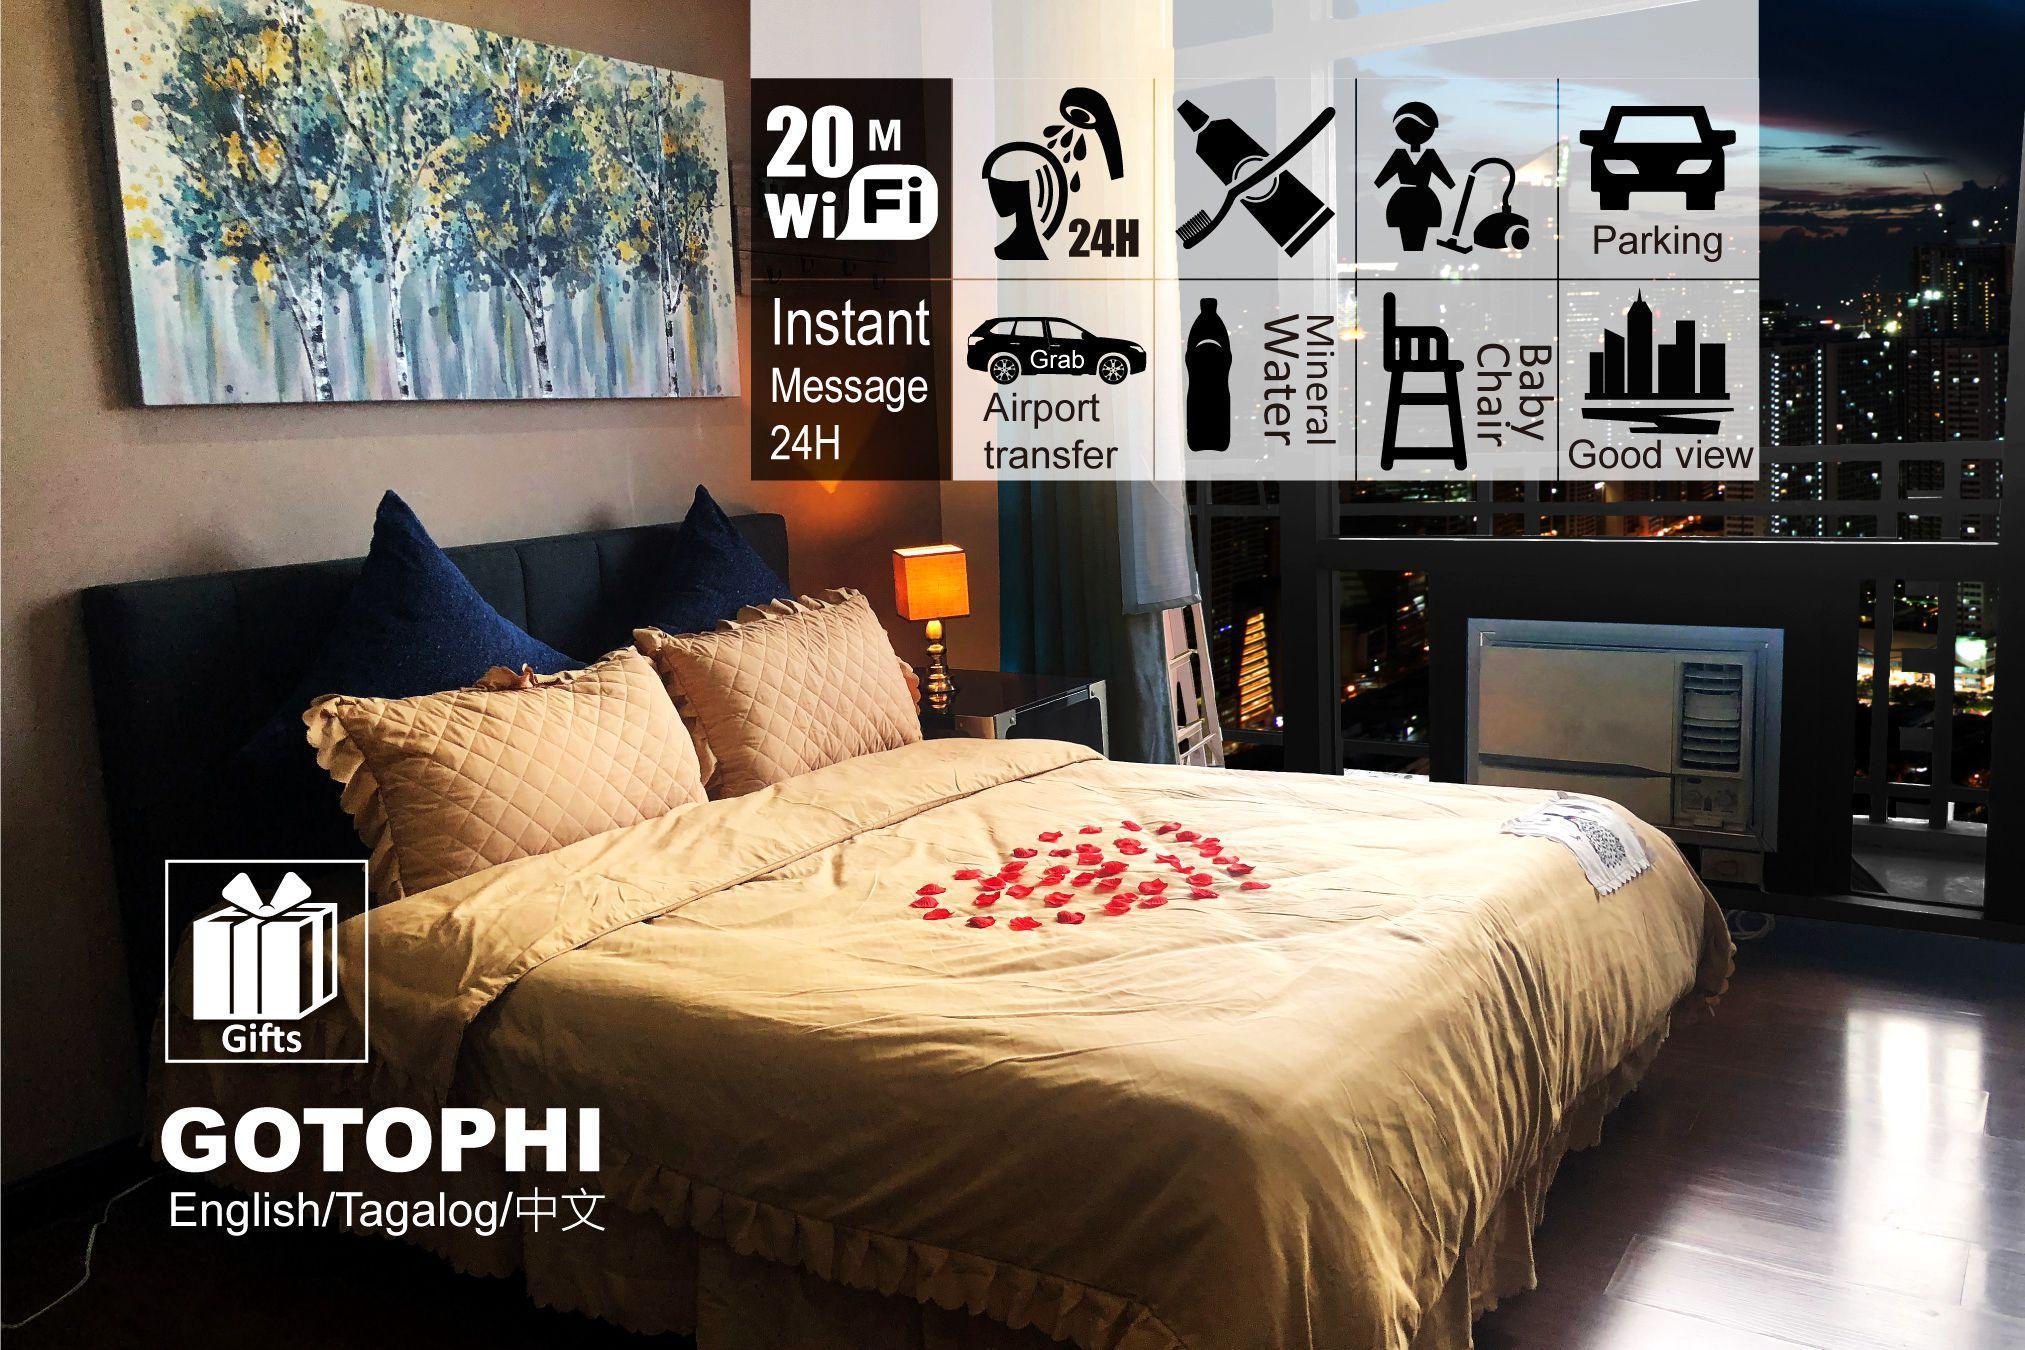 Gotophi Luxurious 5Star Hotel Gramercy Makati 3014